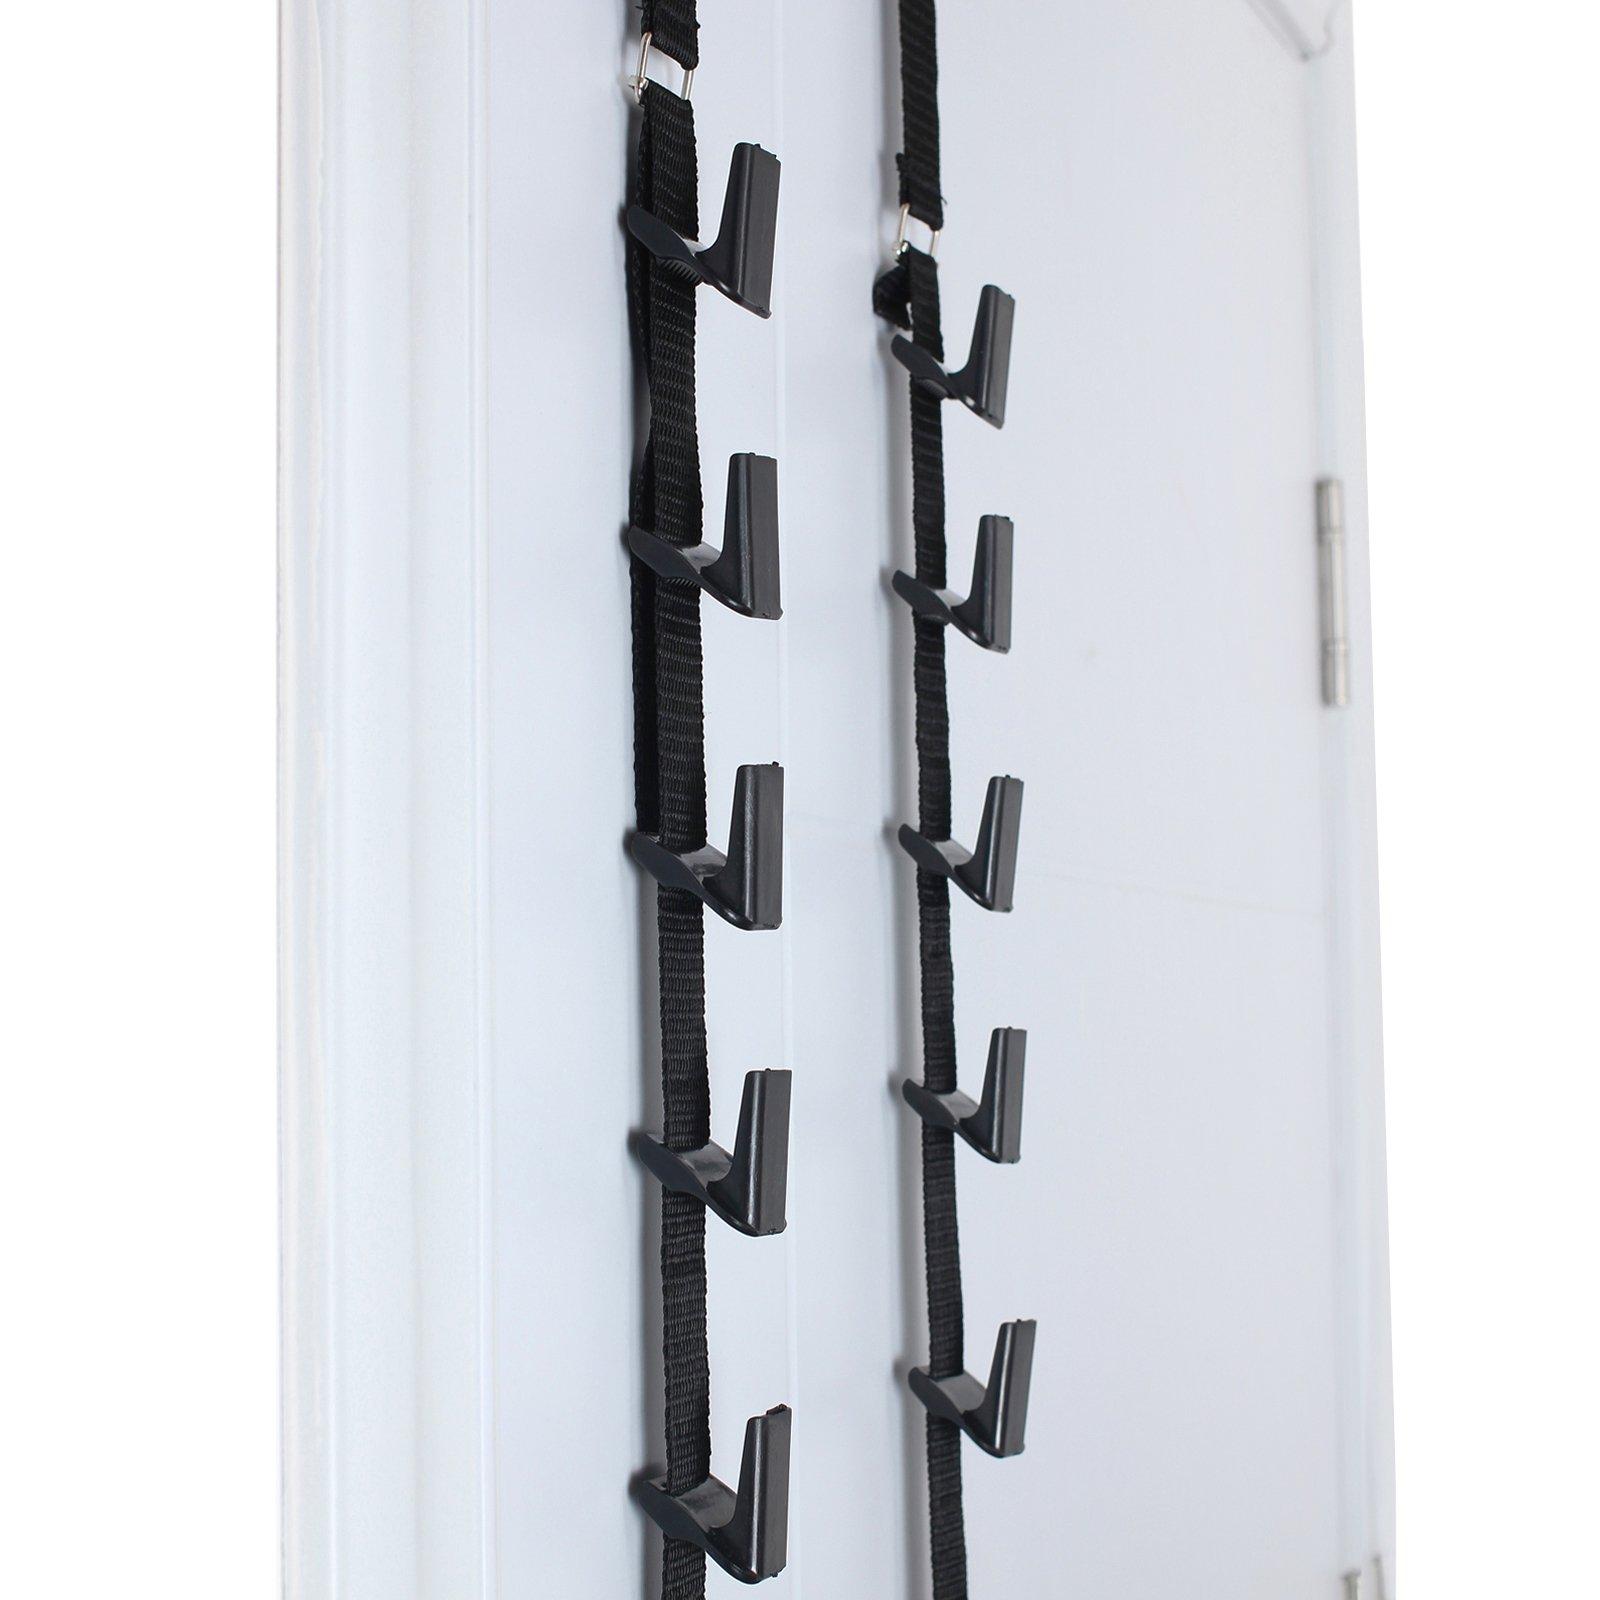 LiNKFOR 2 Pcs Baseball Cap Hat Rack Holder Organizer Storage Door Closet Hanger Adjustable